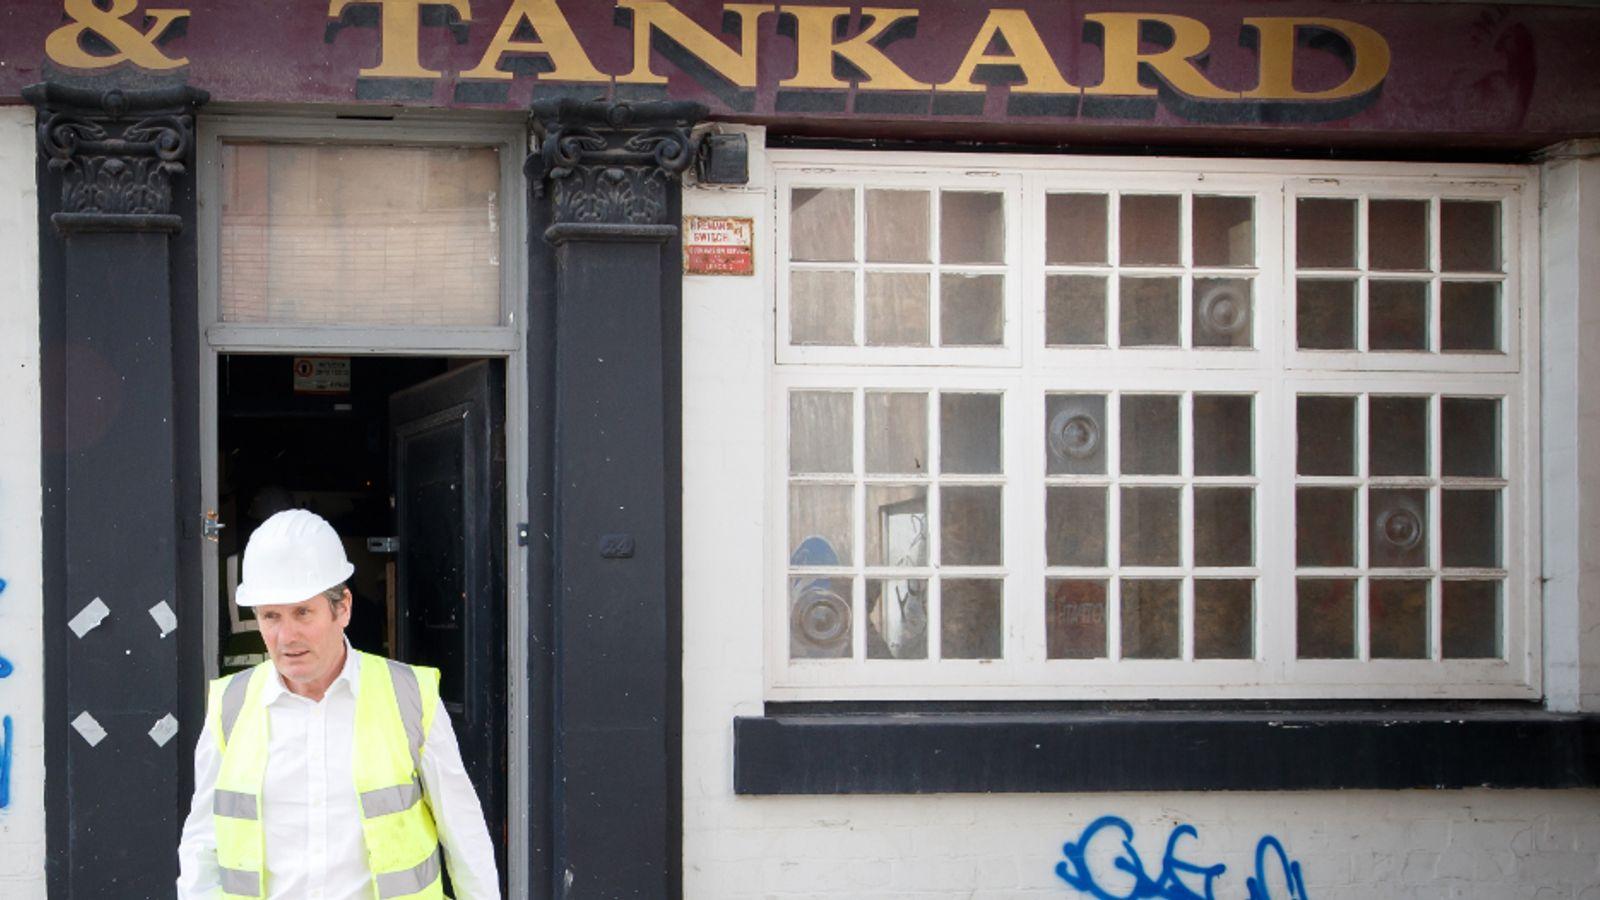 COVID-19: 'British instinct' against vaccine passports for pub, says Labour leader Sir Keir Starmer